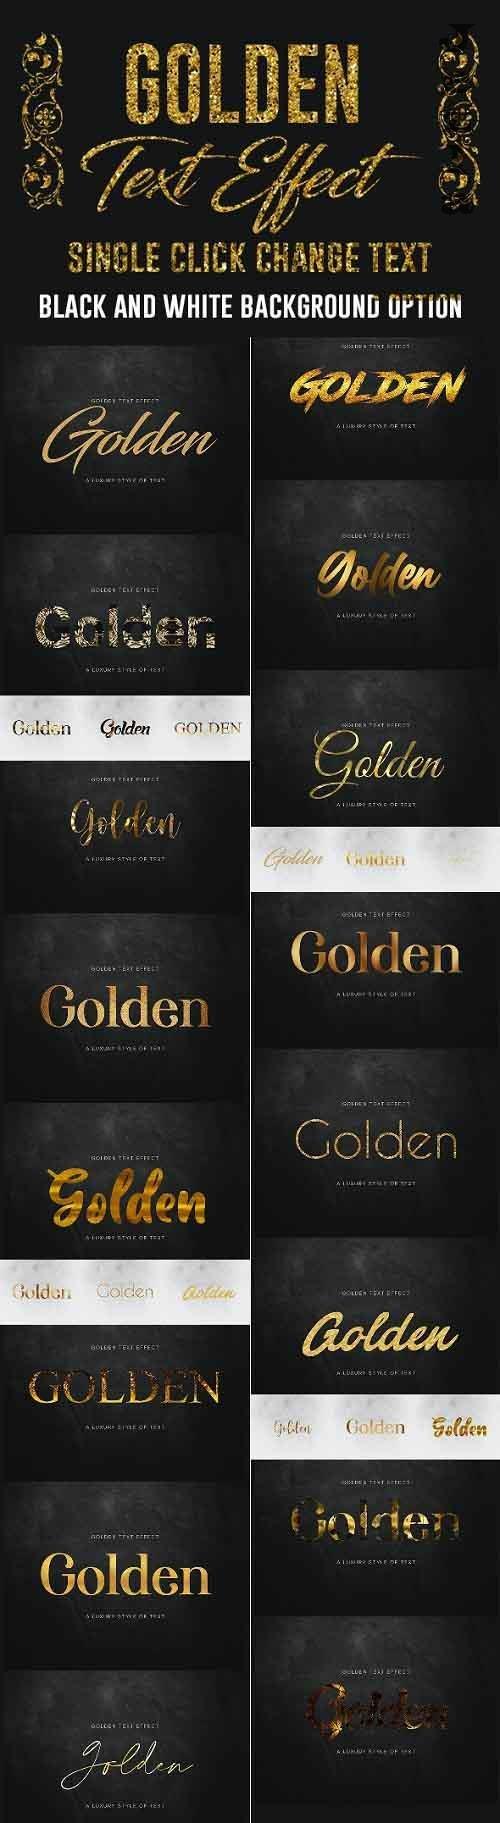 Gold Text Effect 27917080